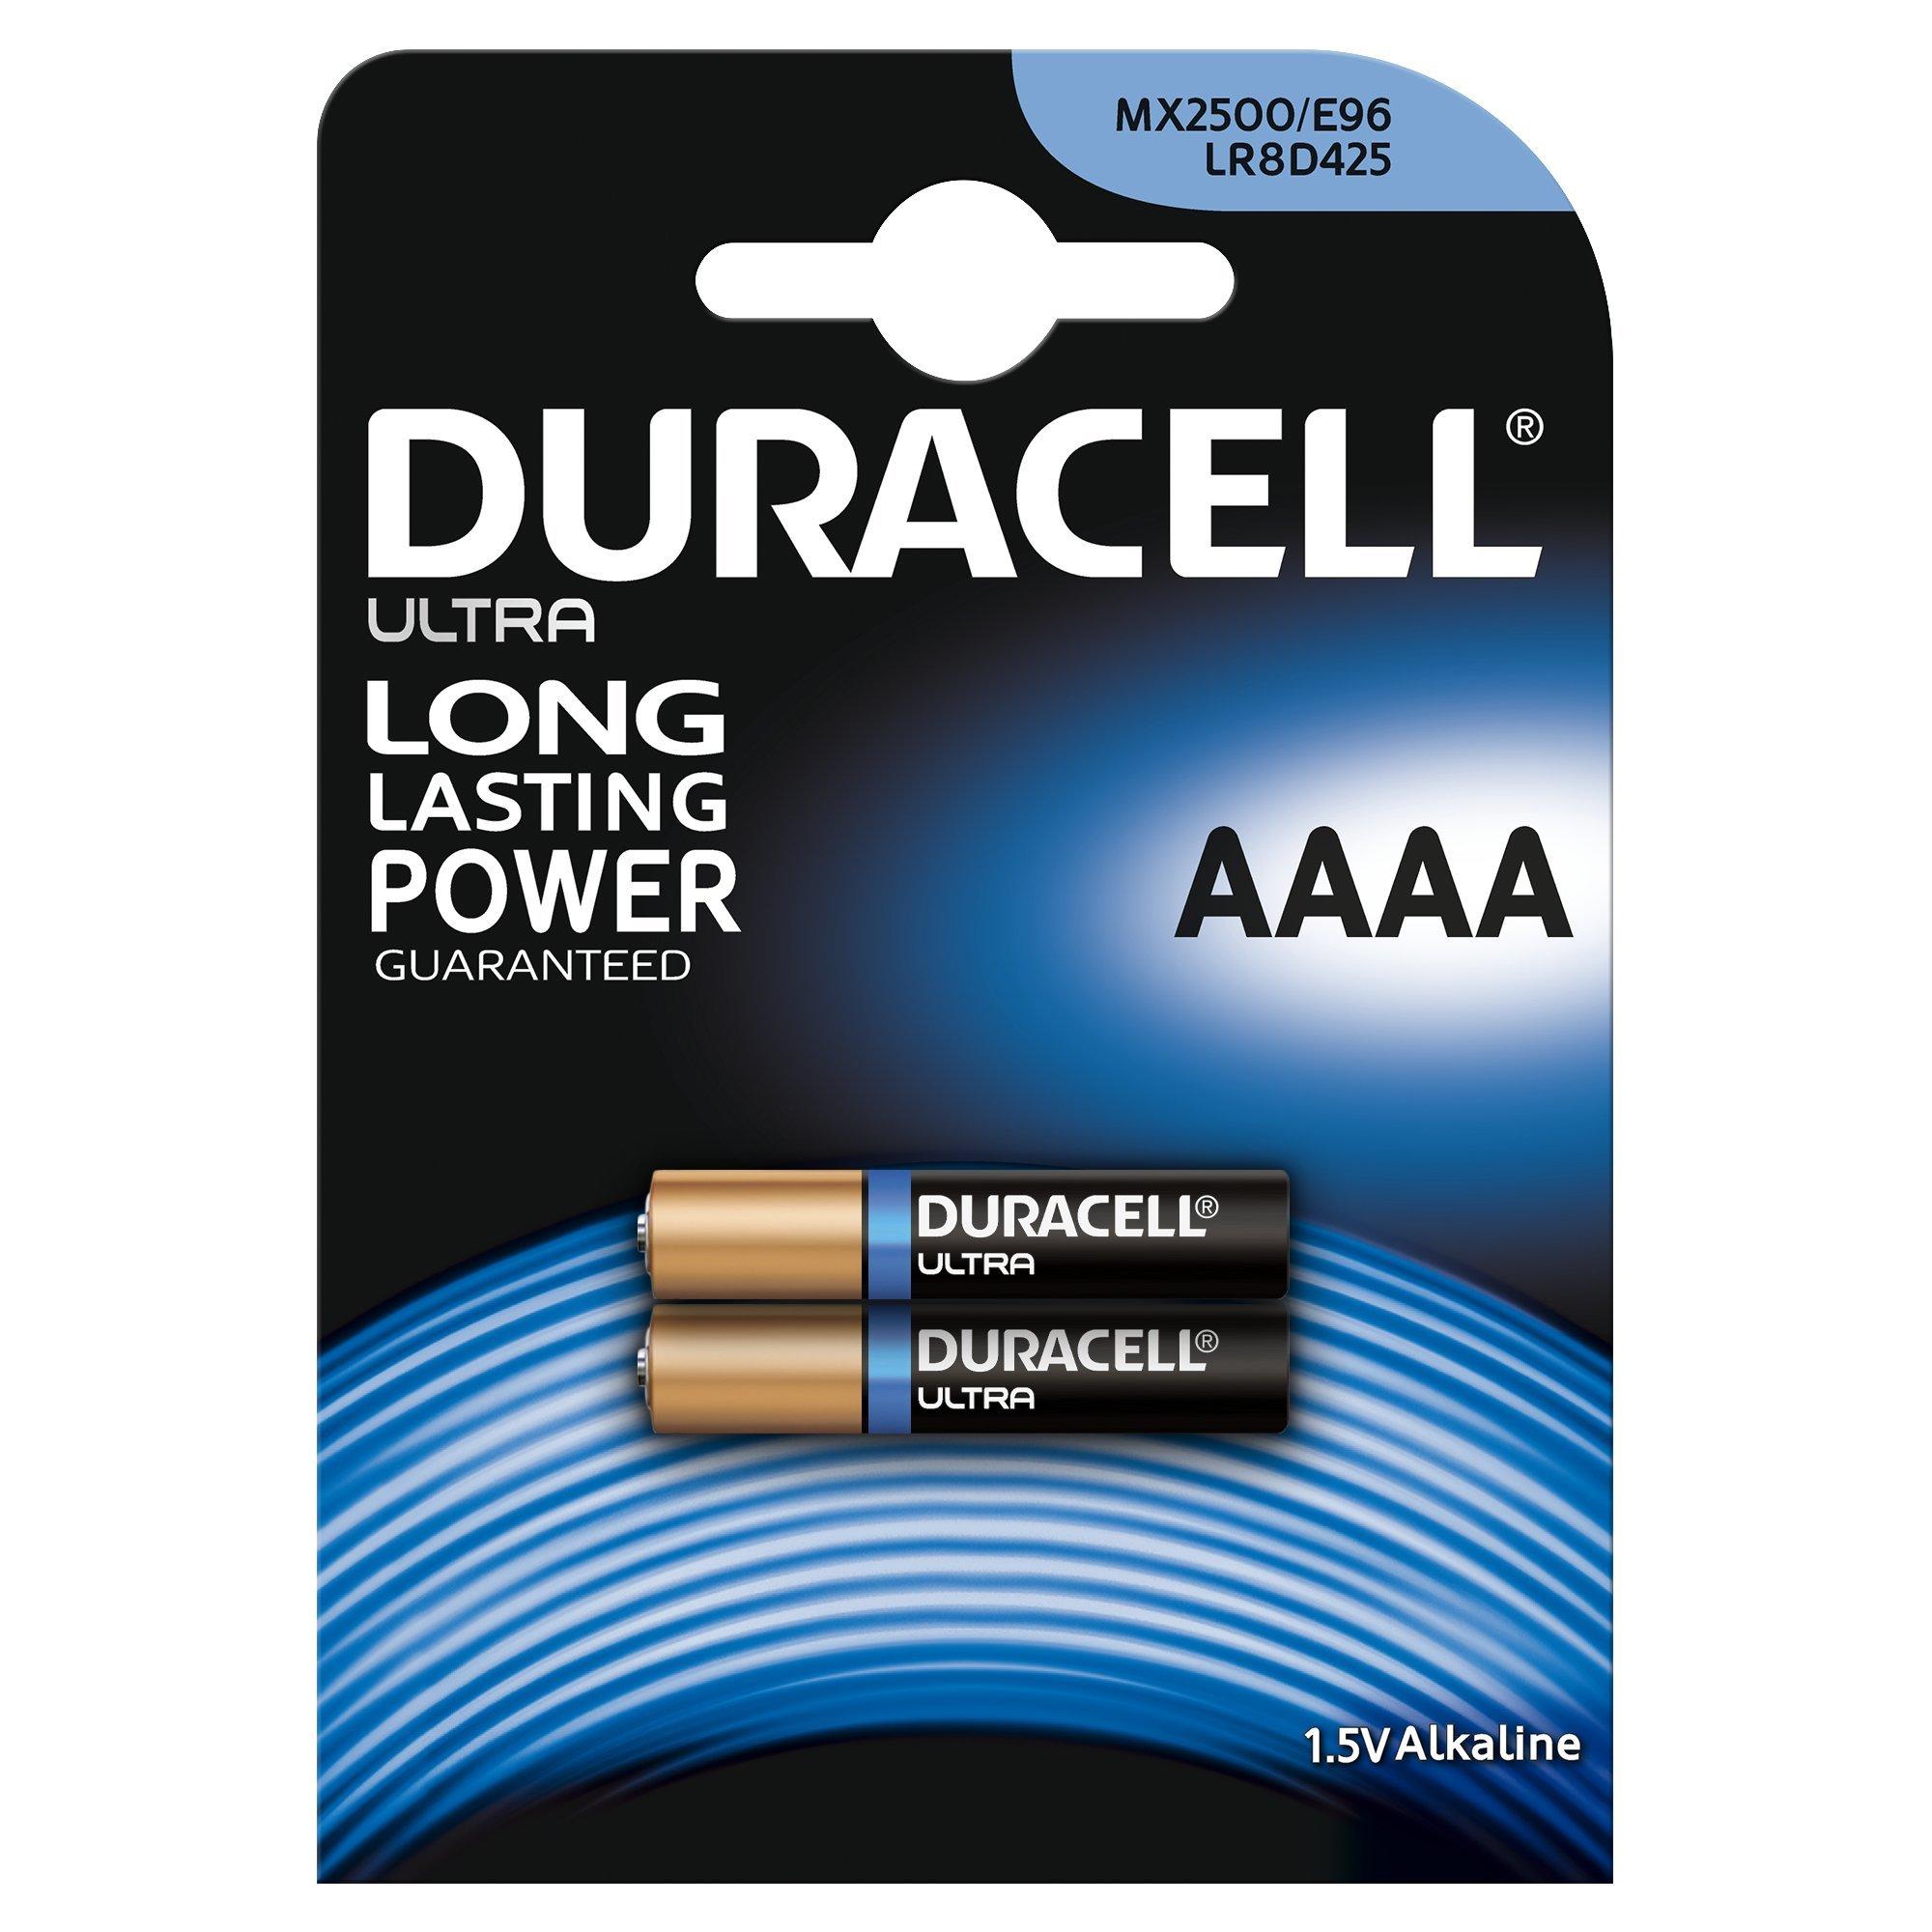 Duracell Marine Battery >> Cheap Duracell Marine Batteries Find Duracell Marine Batteries